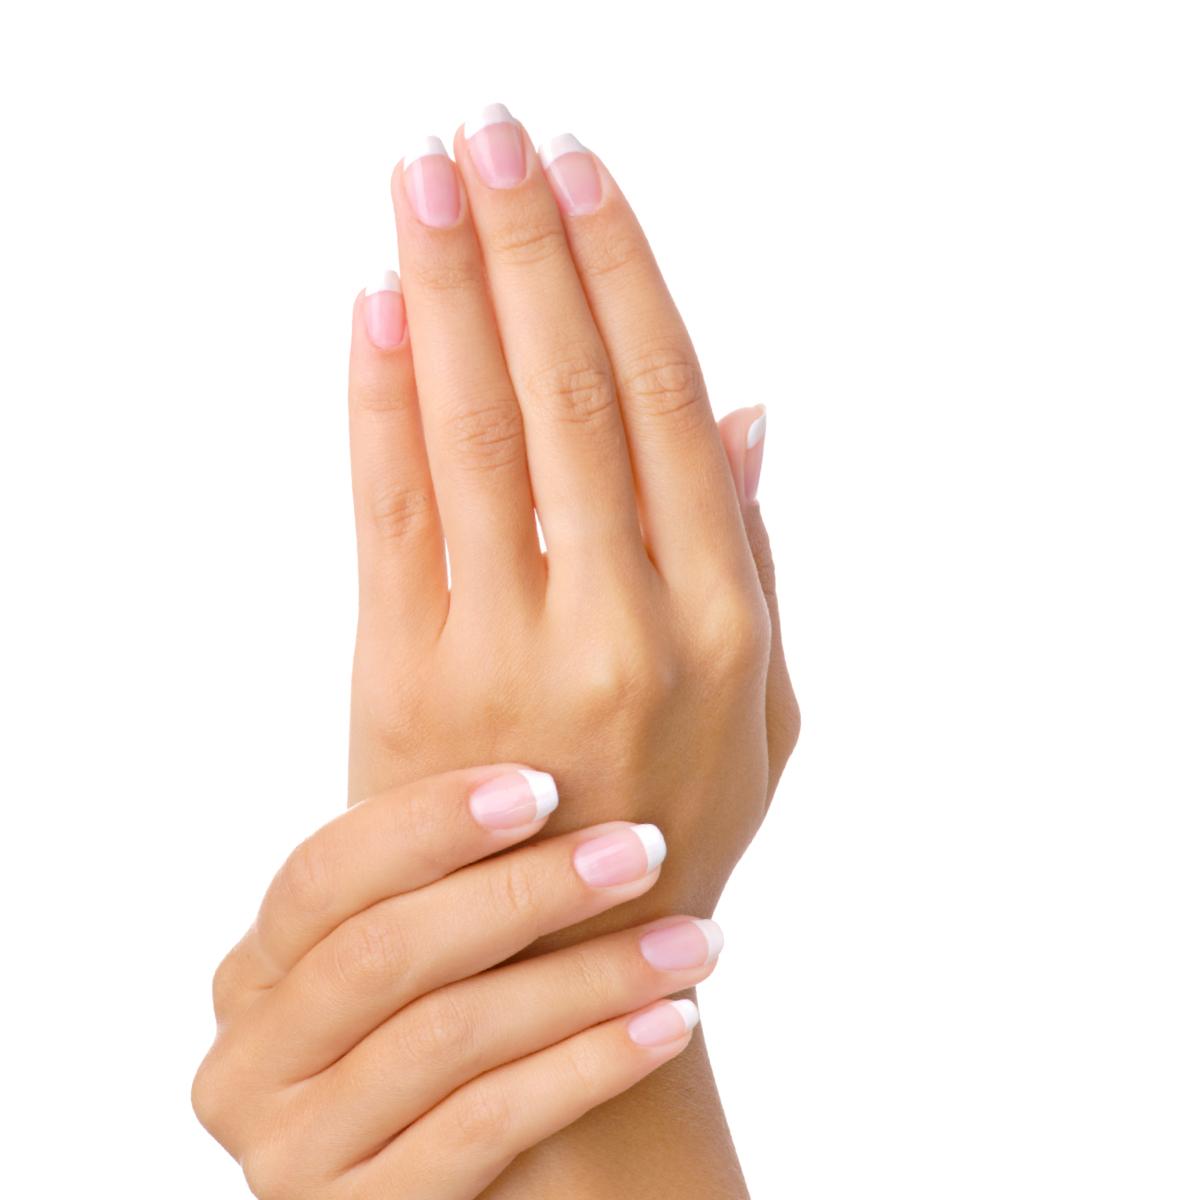 RODINNÁ SADA 2+1 ZDARMA gel na ruce, s vysokým obsahem alkoholu, BACILEX® ultraHYGIENE+